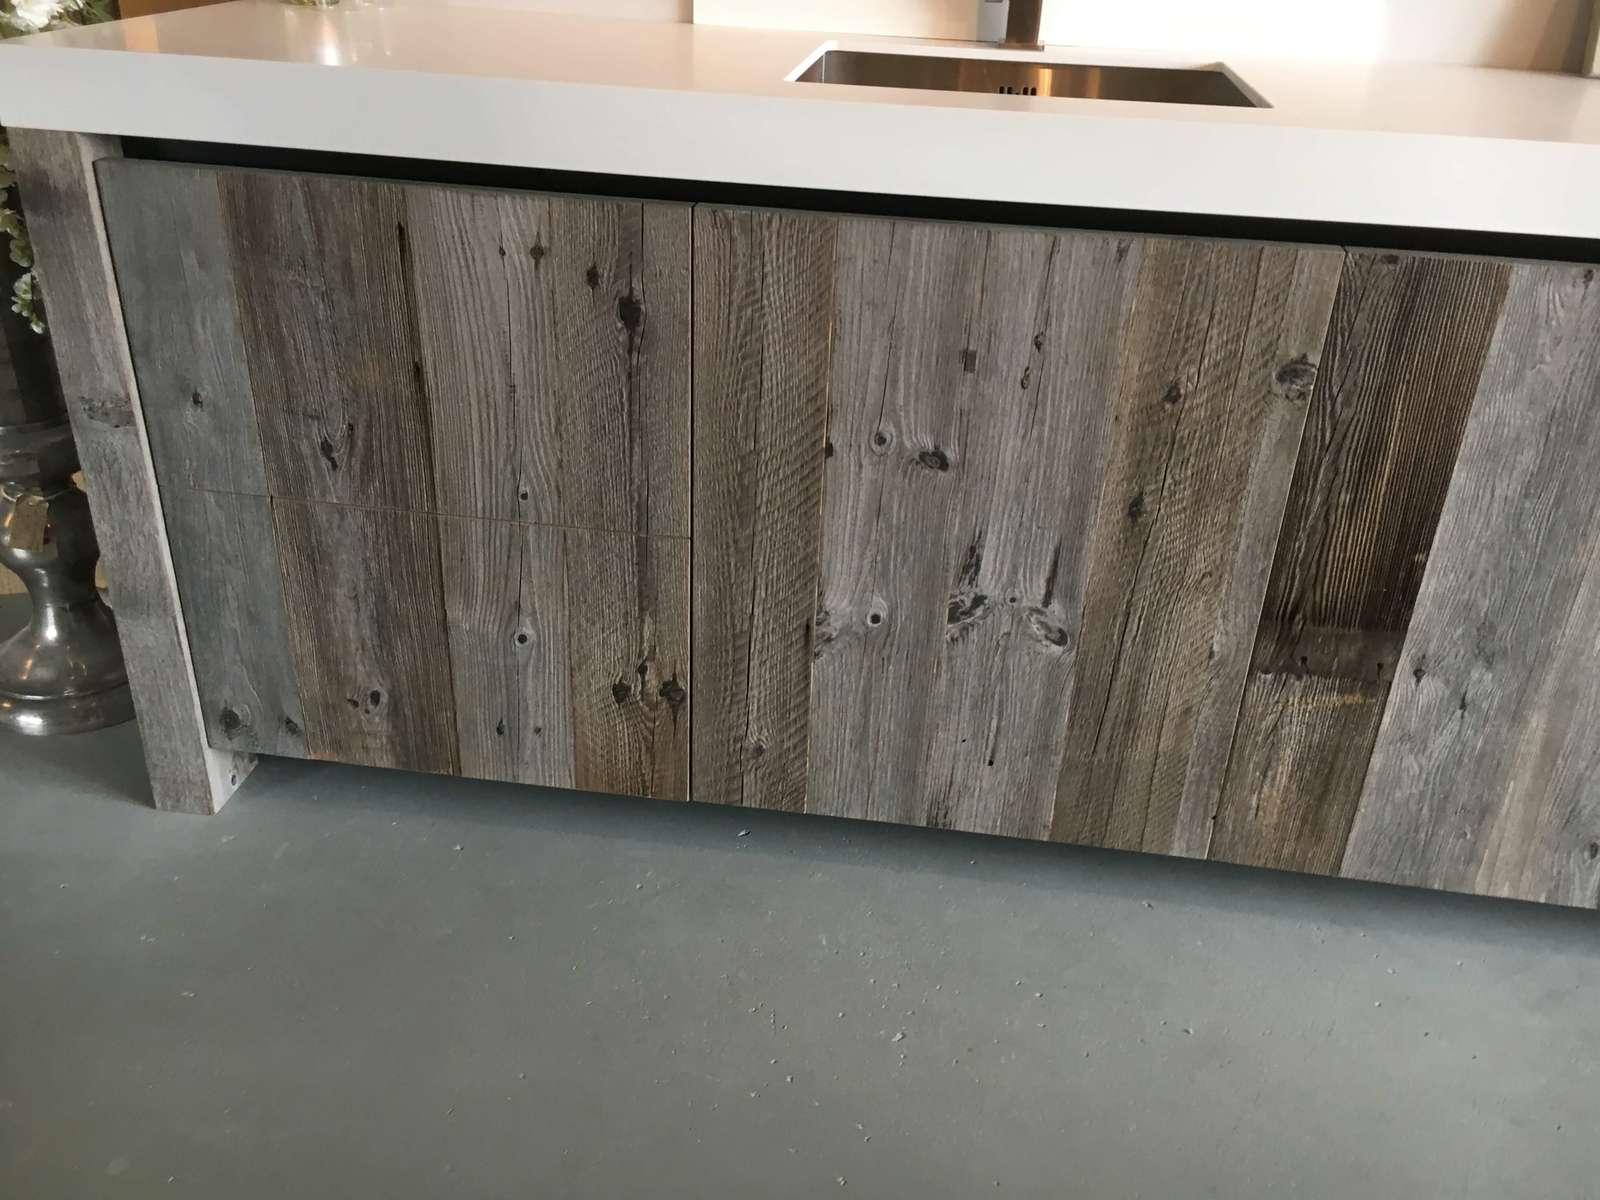 Innsbruck – Wood Panels Rustic Look Reclaimed Distressed Timber For Recent Burnt Tannin 4 Door Sideboards (Gallery 15 of 20)